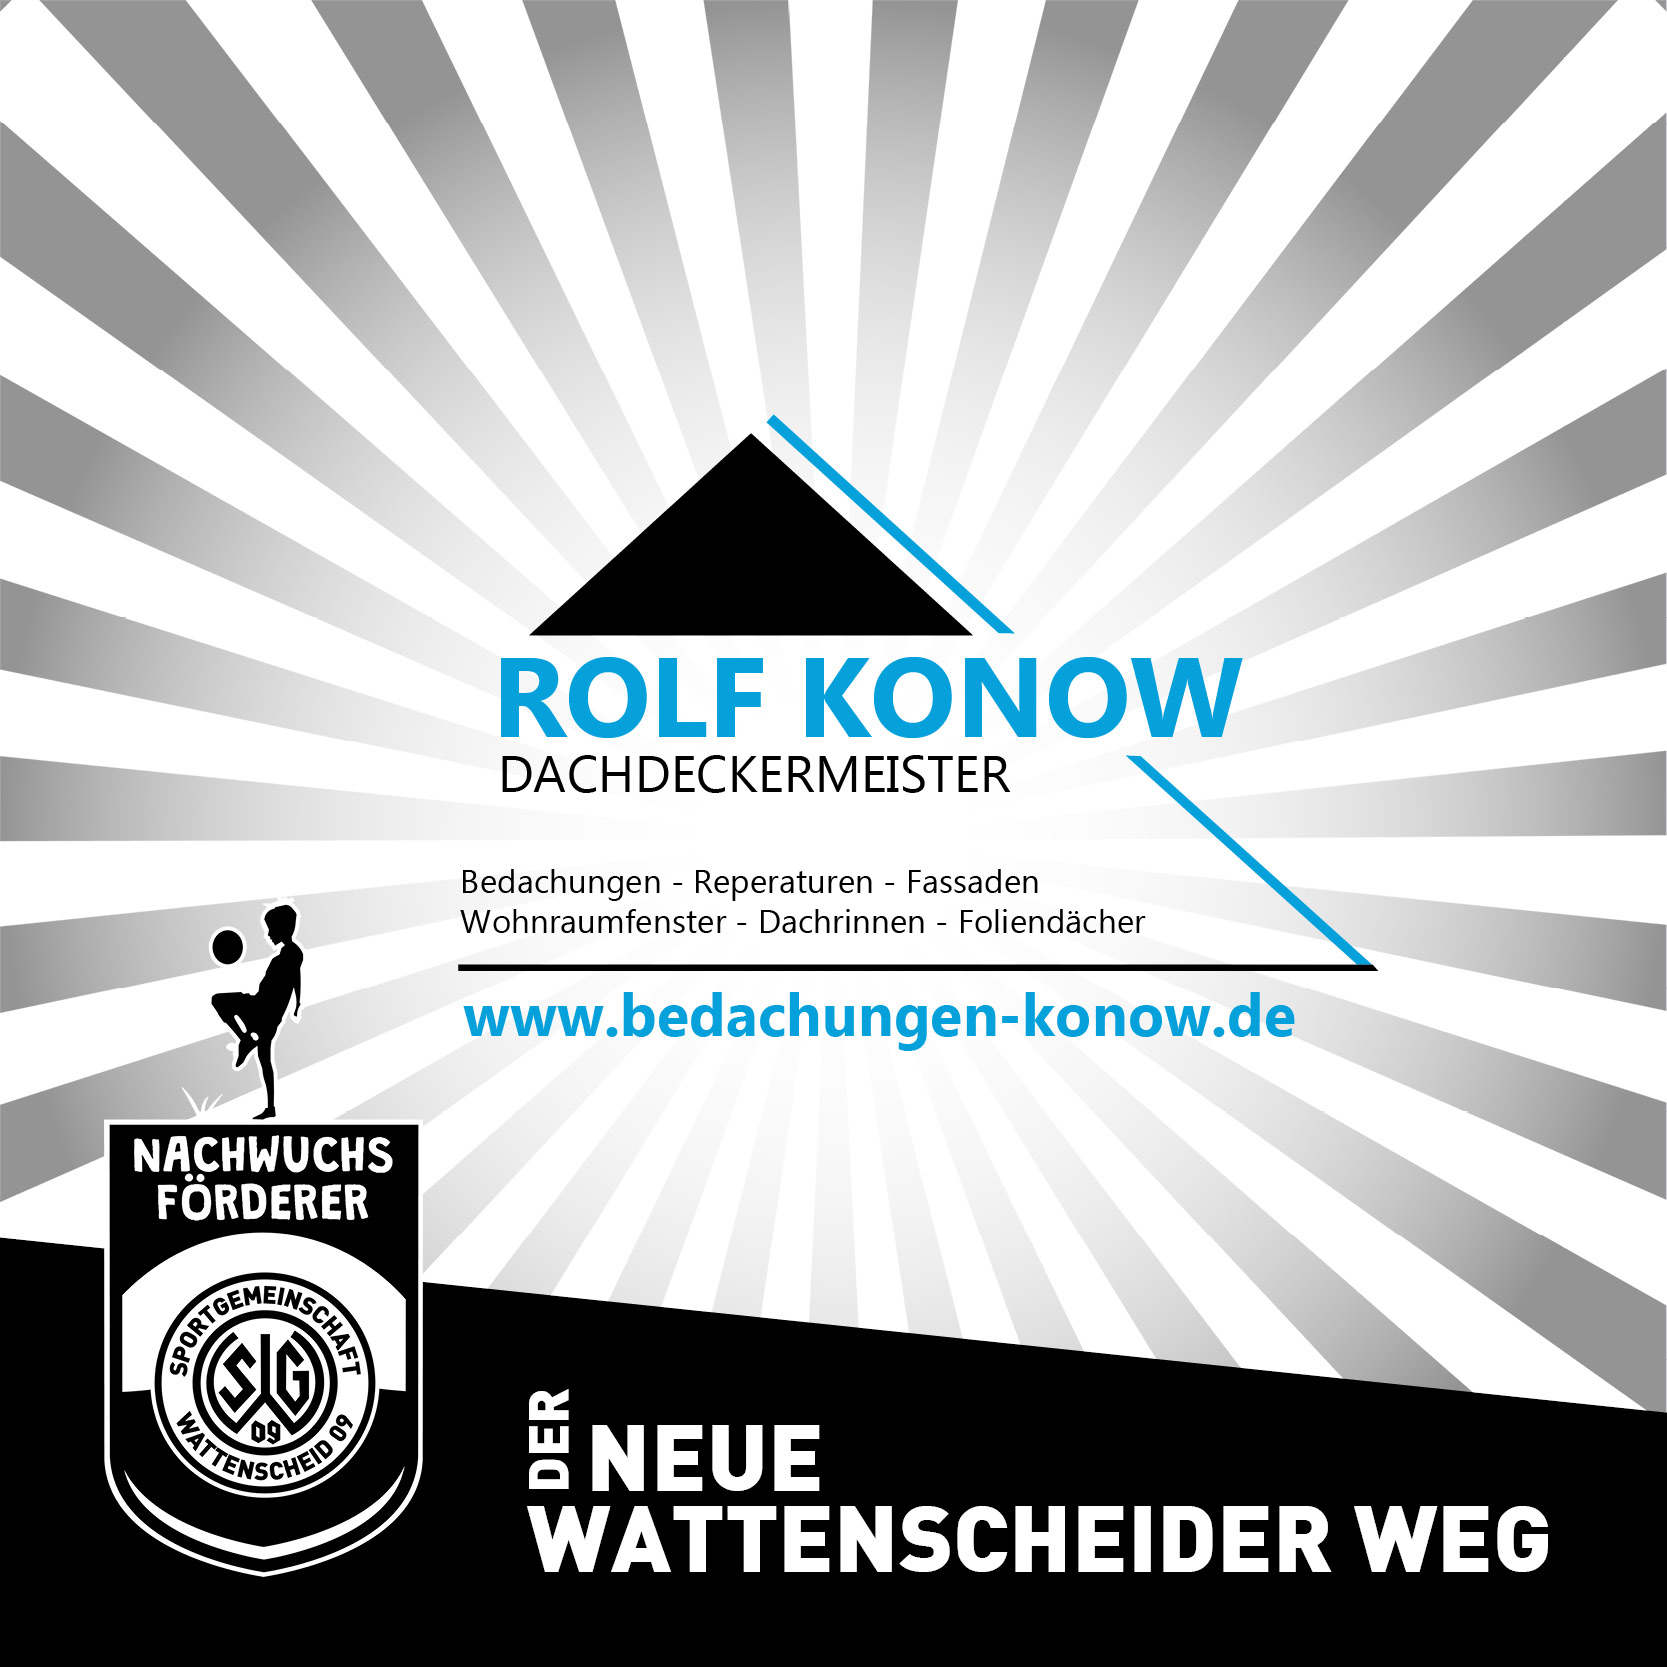 Nachwuchsförderer Rolf Konow